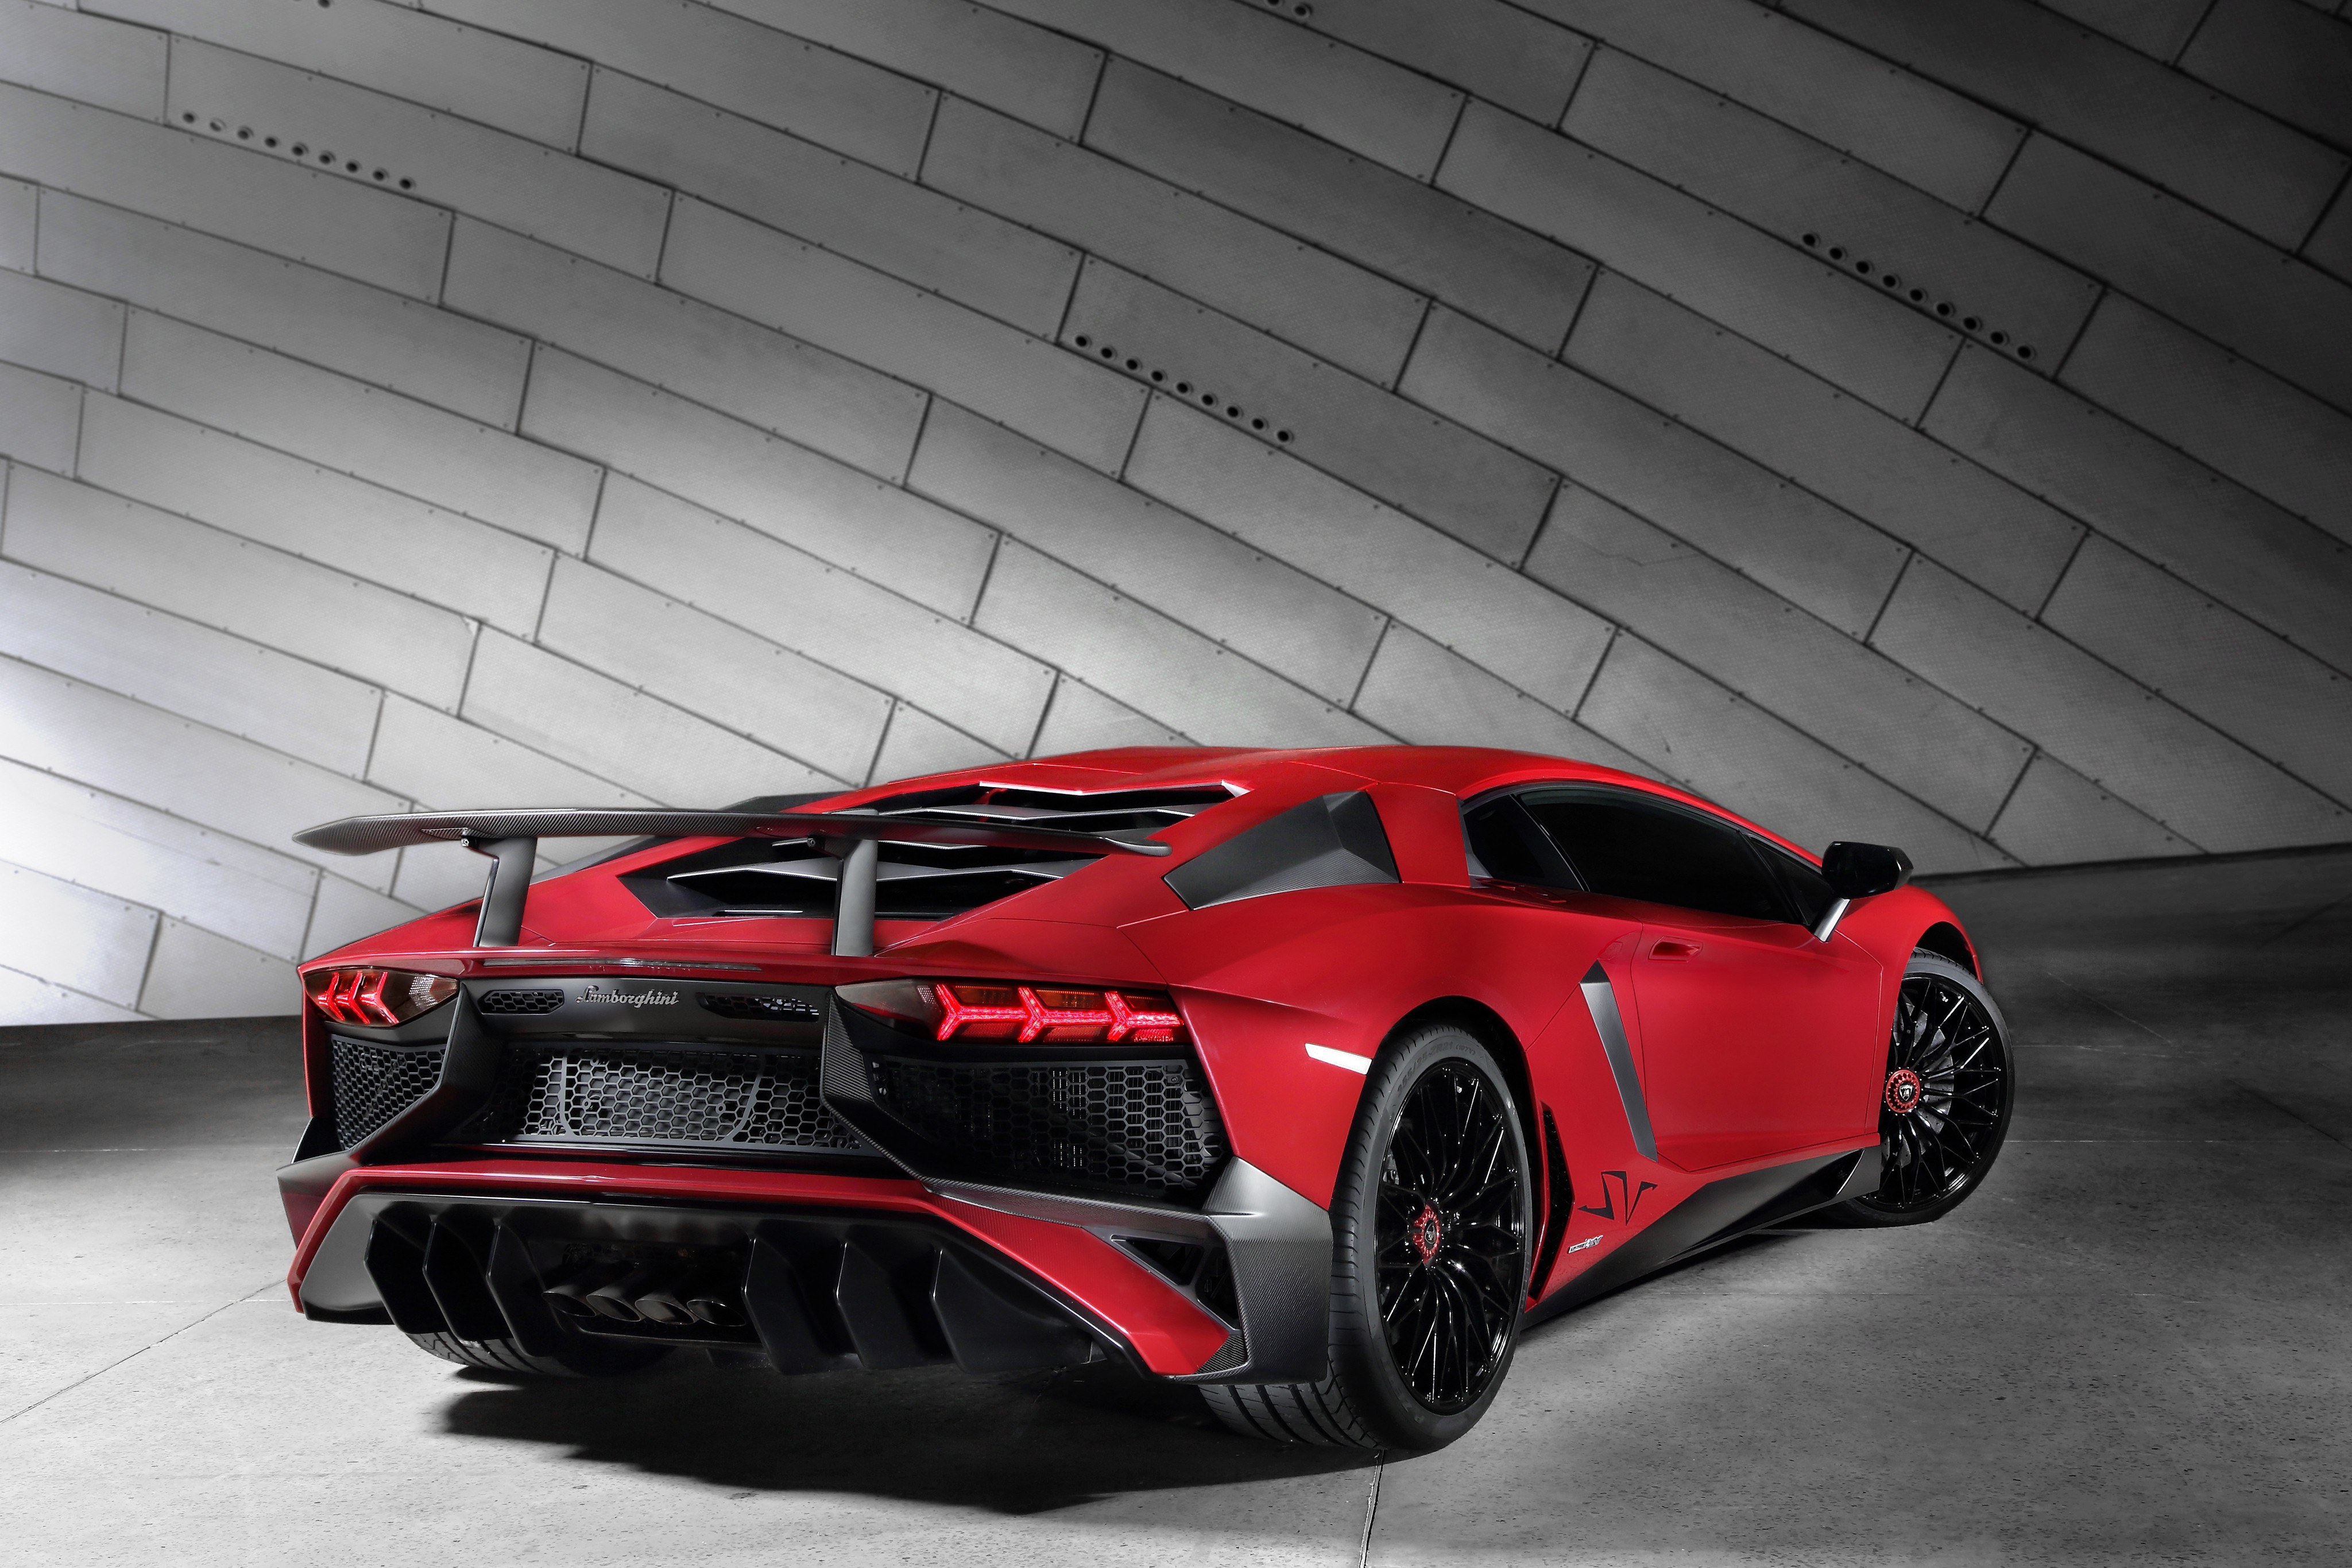 lamborghini aventador lp750 4 sv 2015 present - Lamborghini Aventador 2015 Black